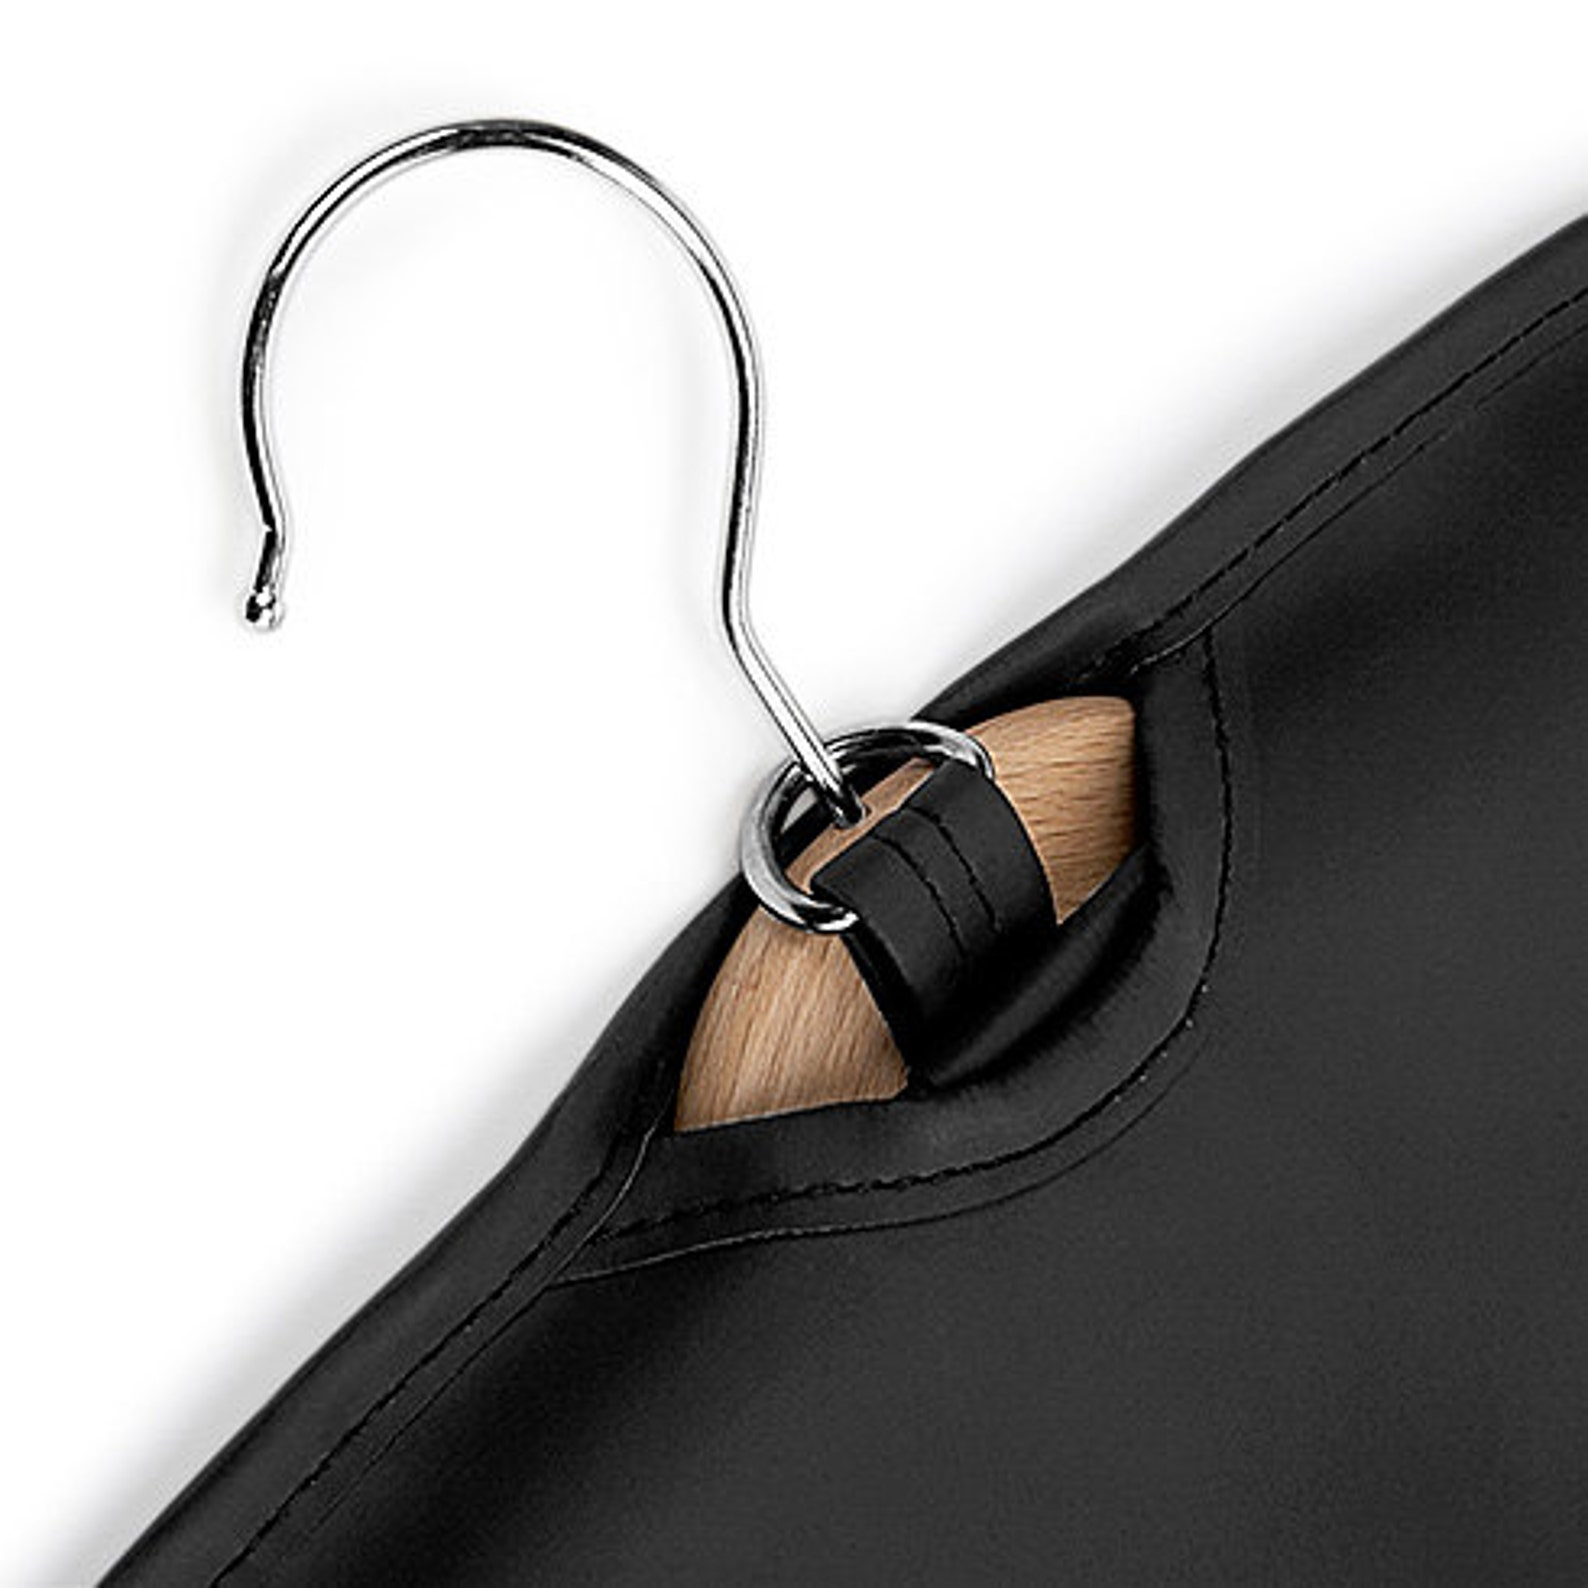 personalised monogram ballet shoe /dance suit carrier/costume garment bag -5 personalized garment bag